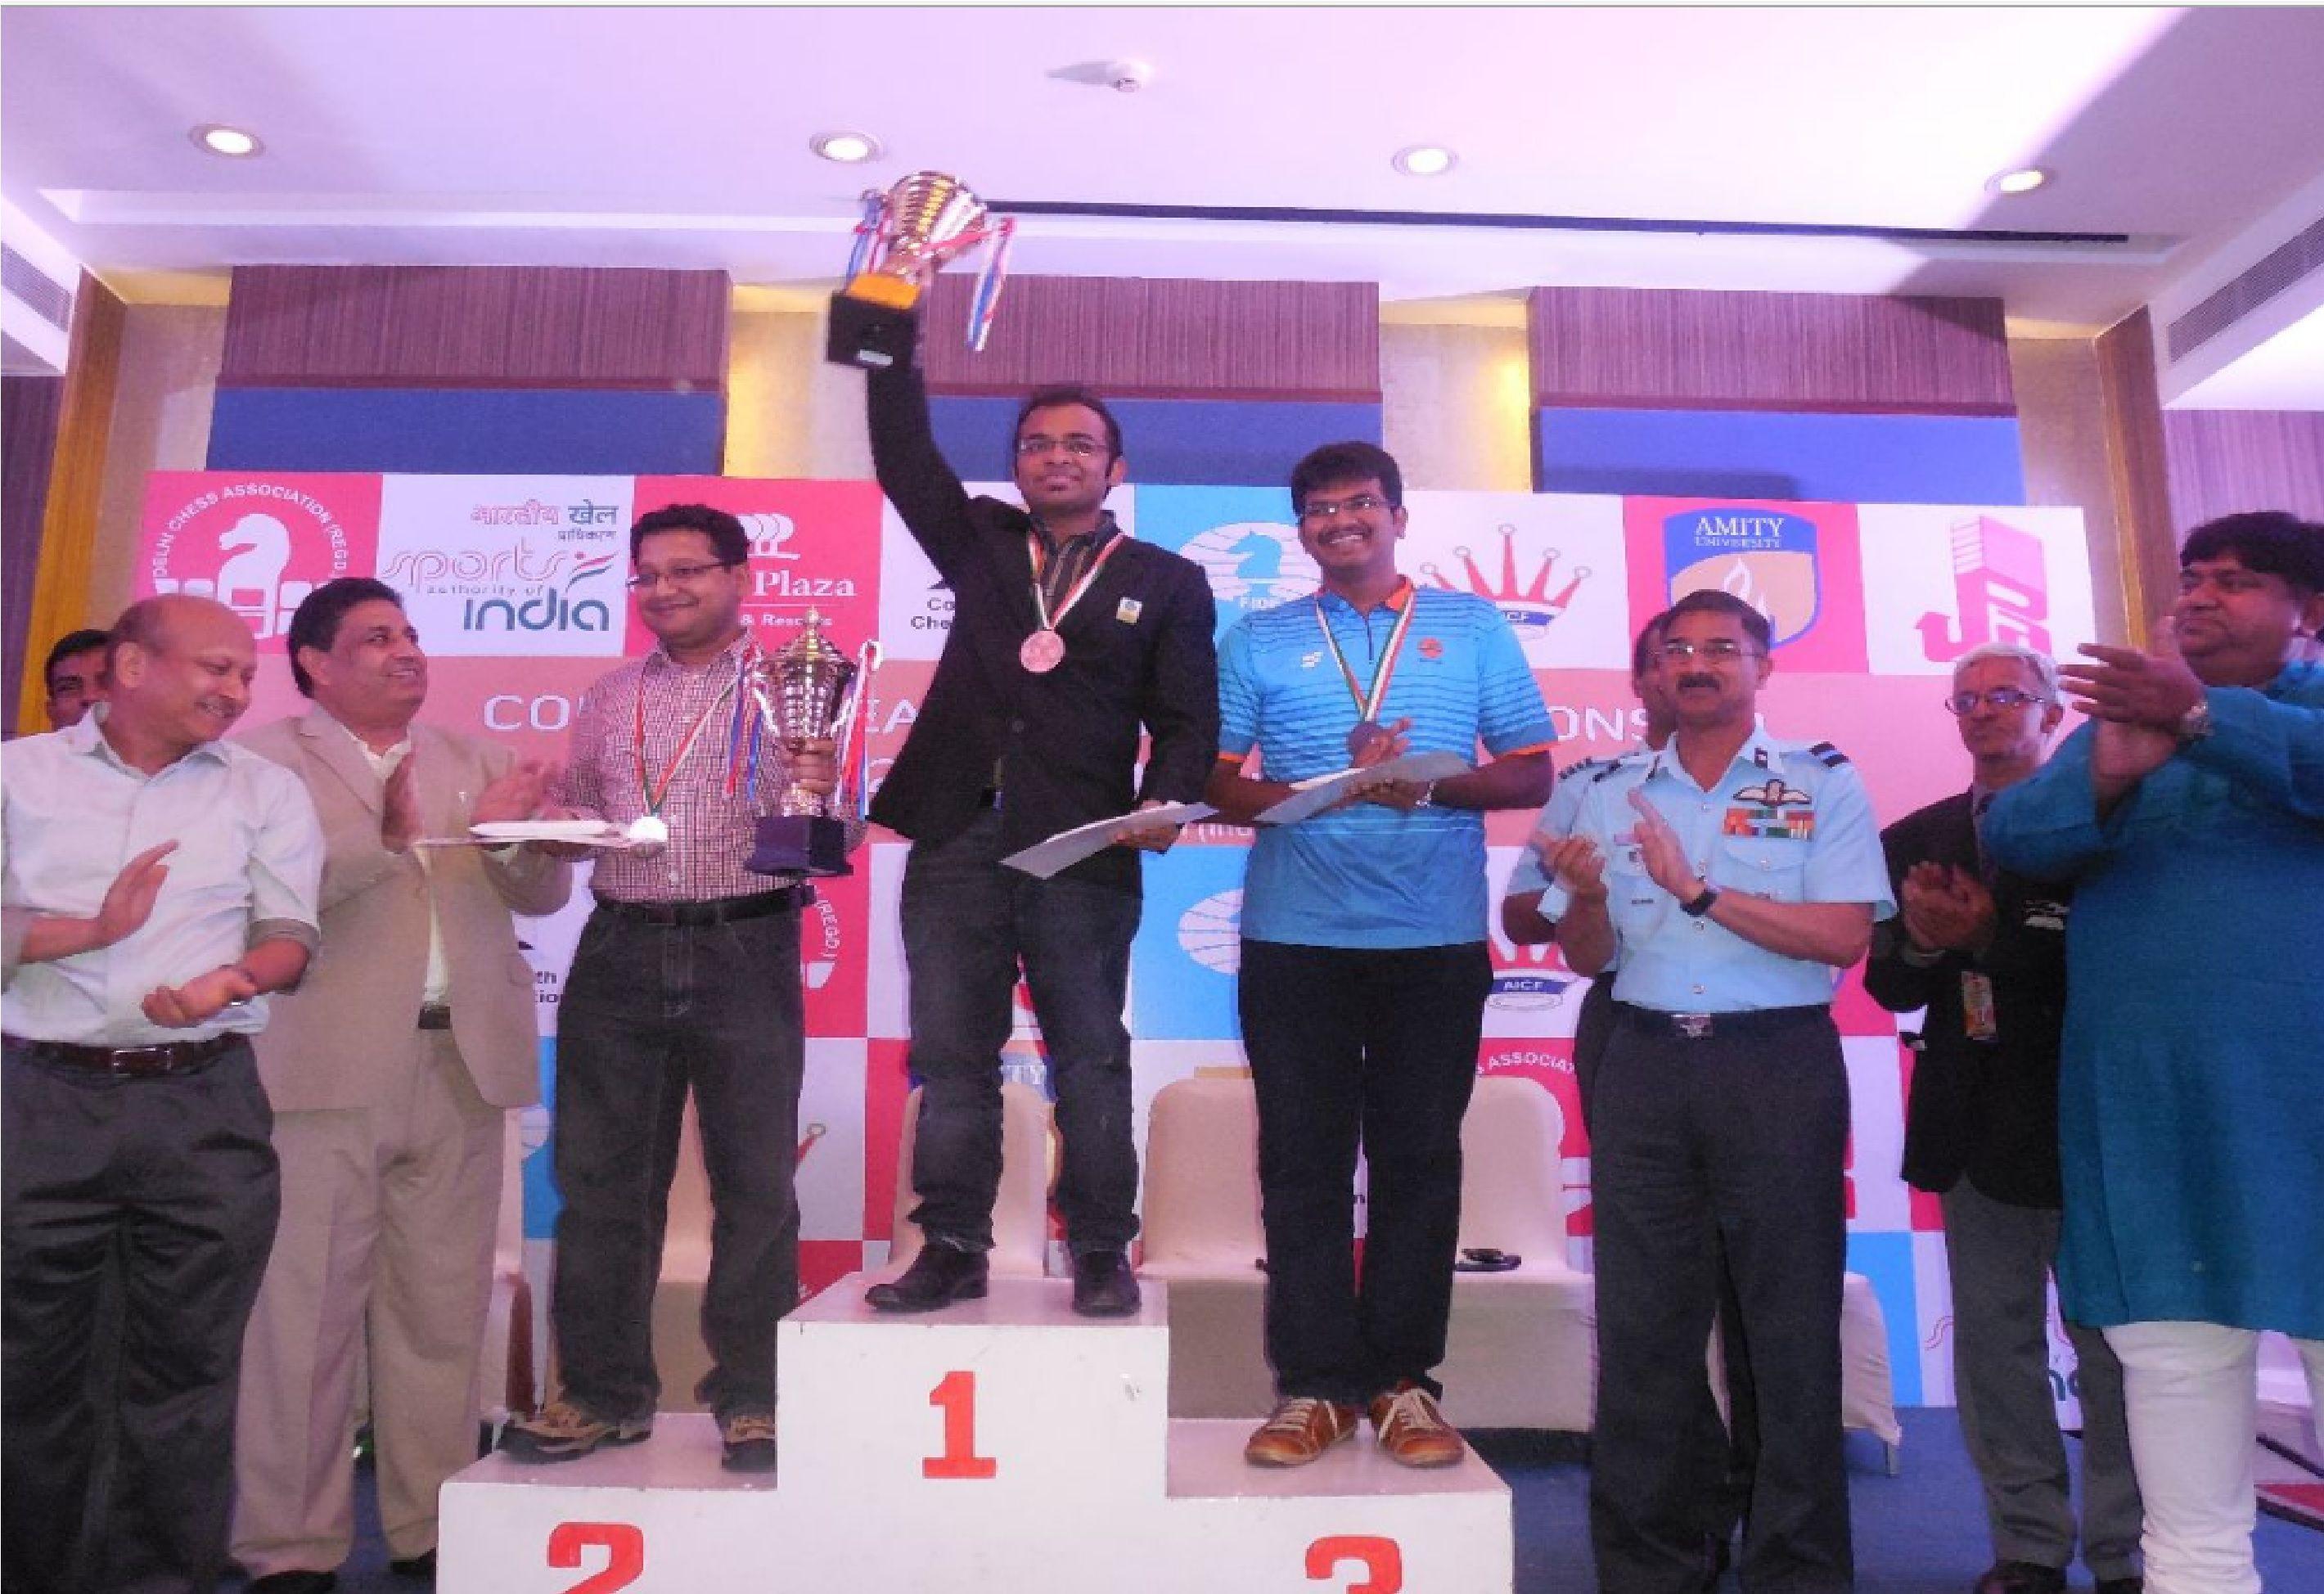 Grandmaster and former world junior champion abhijeet